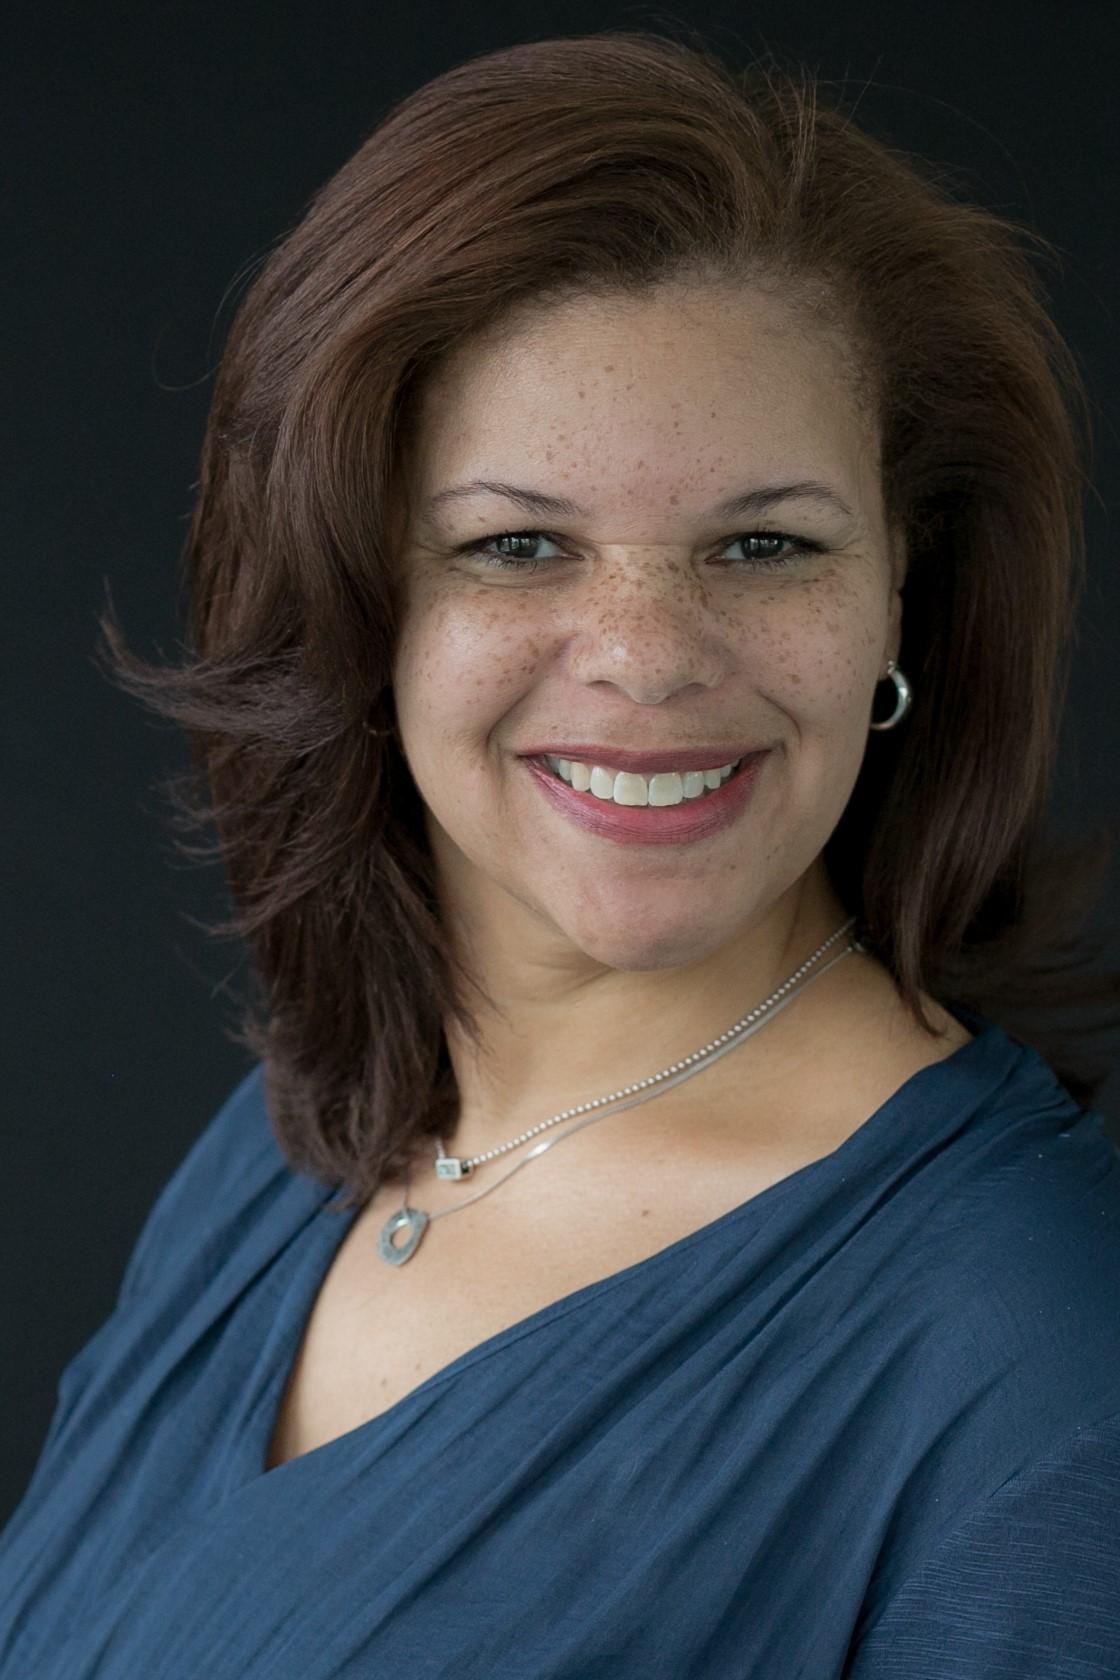 A headshot of Adele Dowell